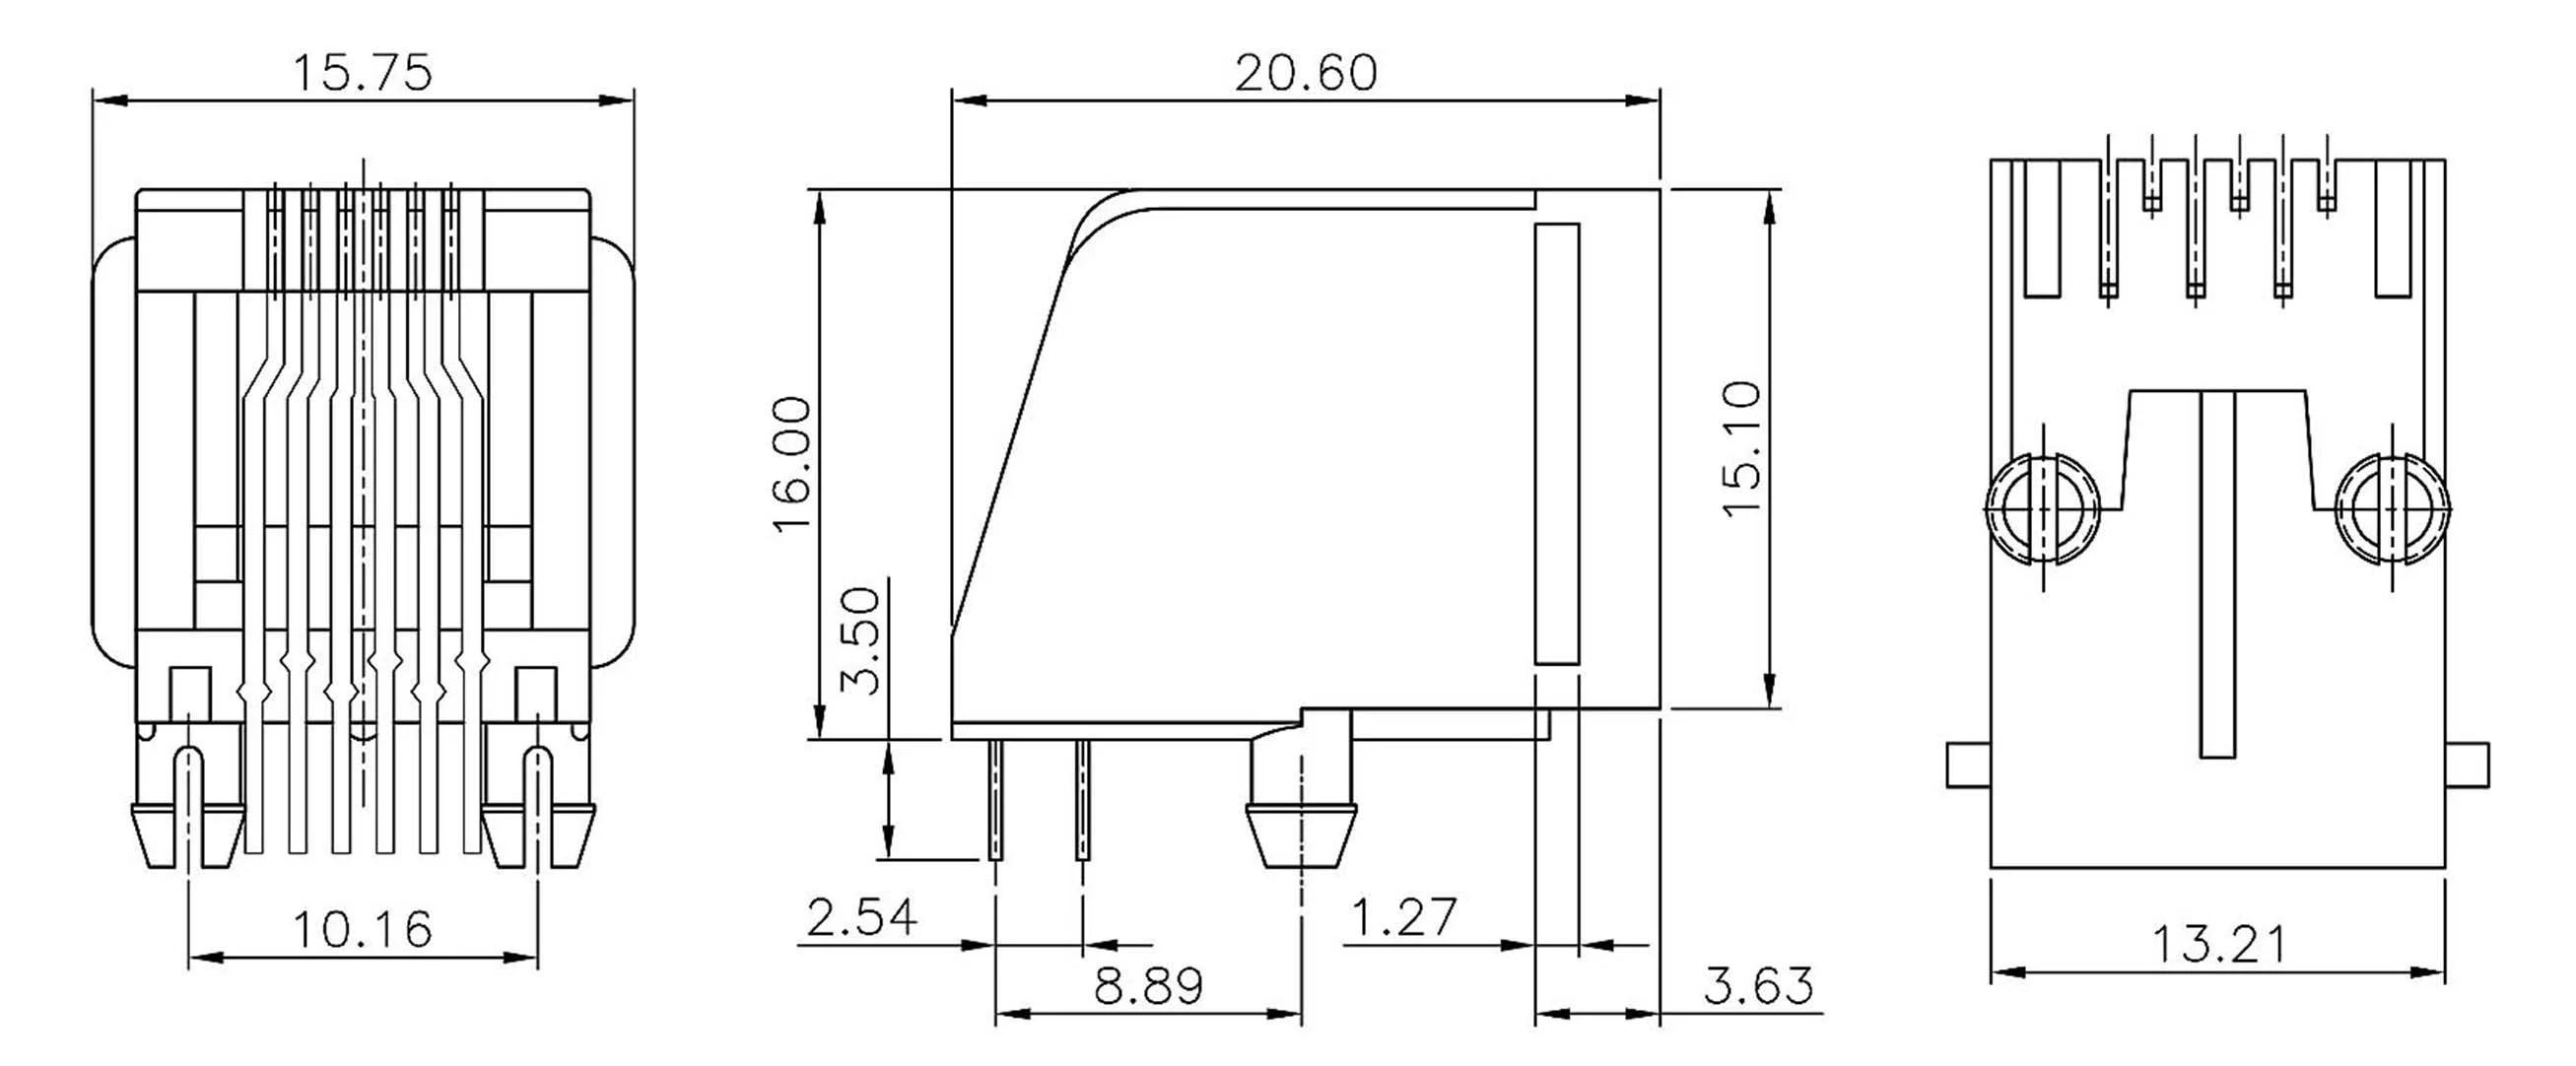 Rj12 Wiring Diagram For Pools